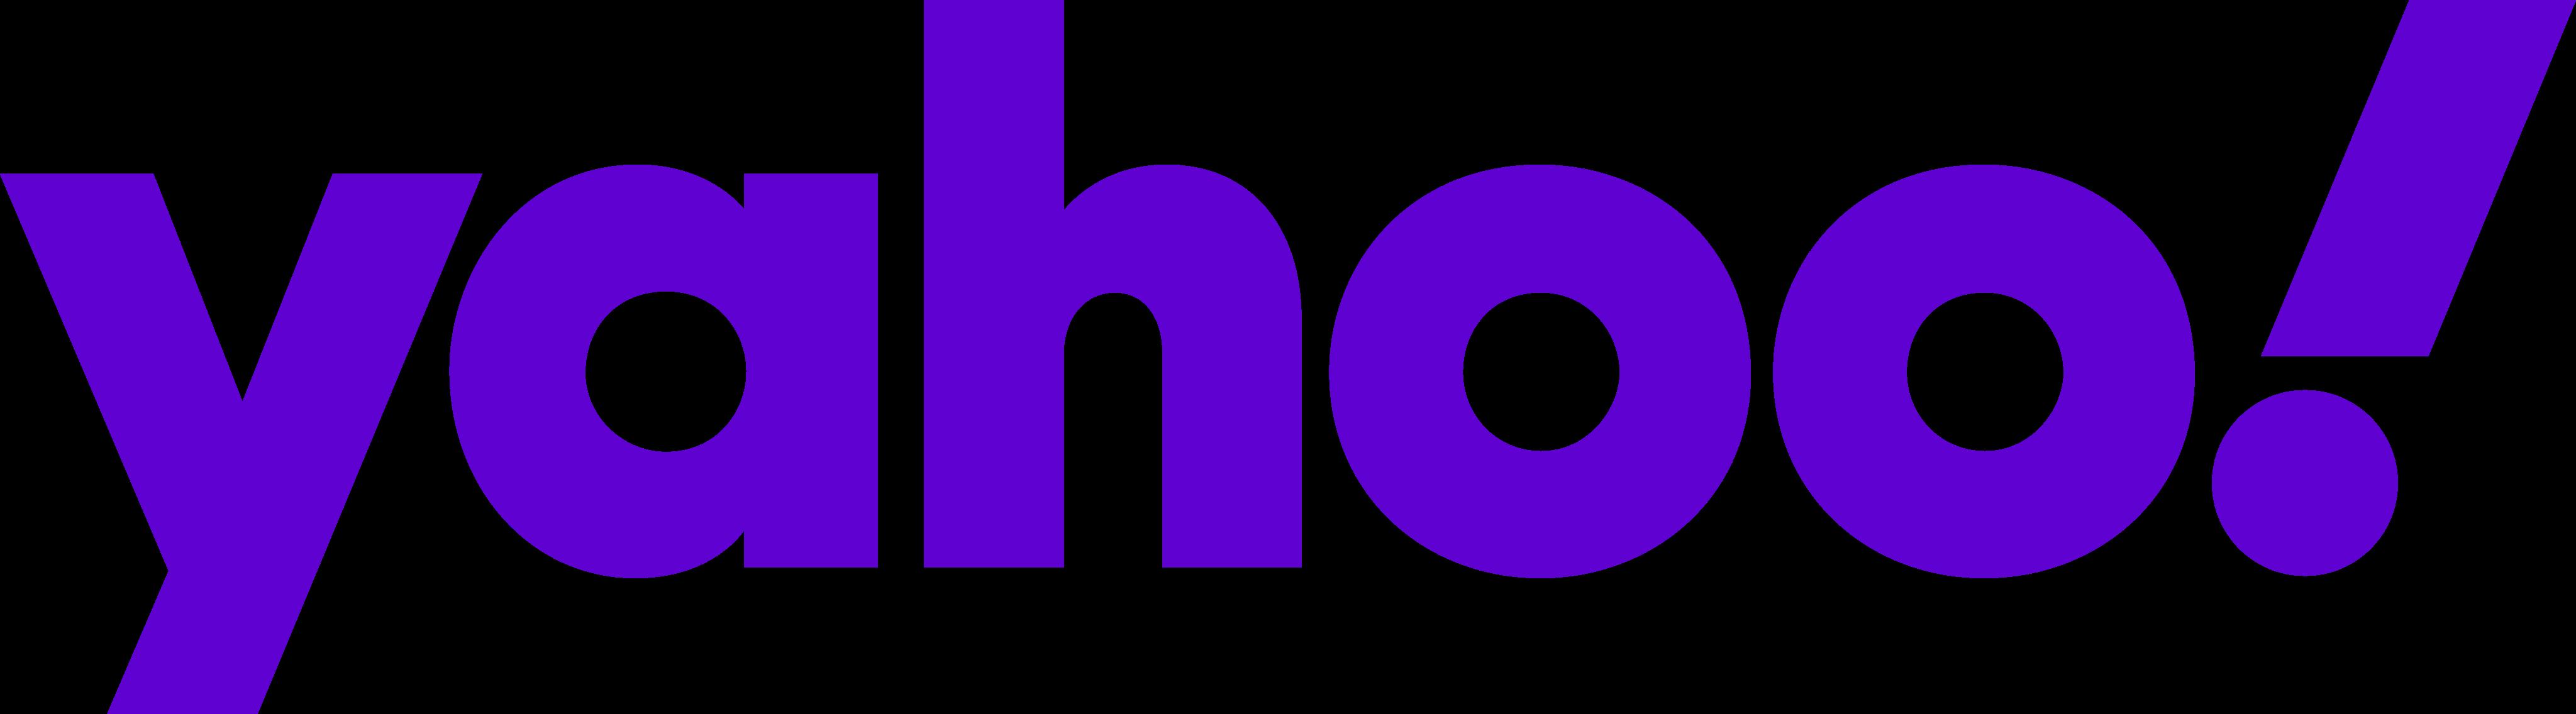 Yahoo Logo PNG